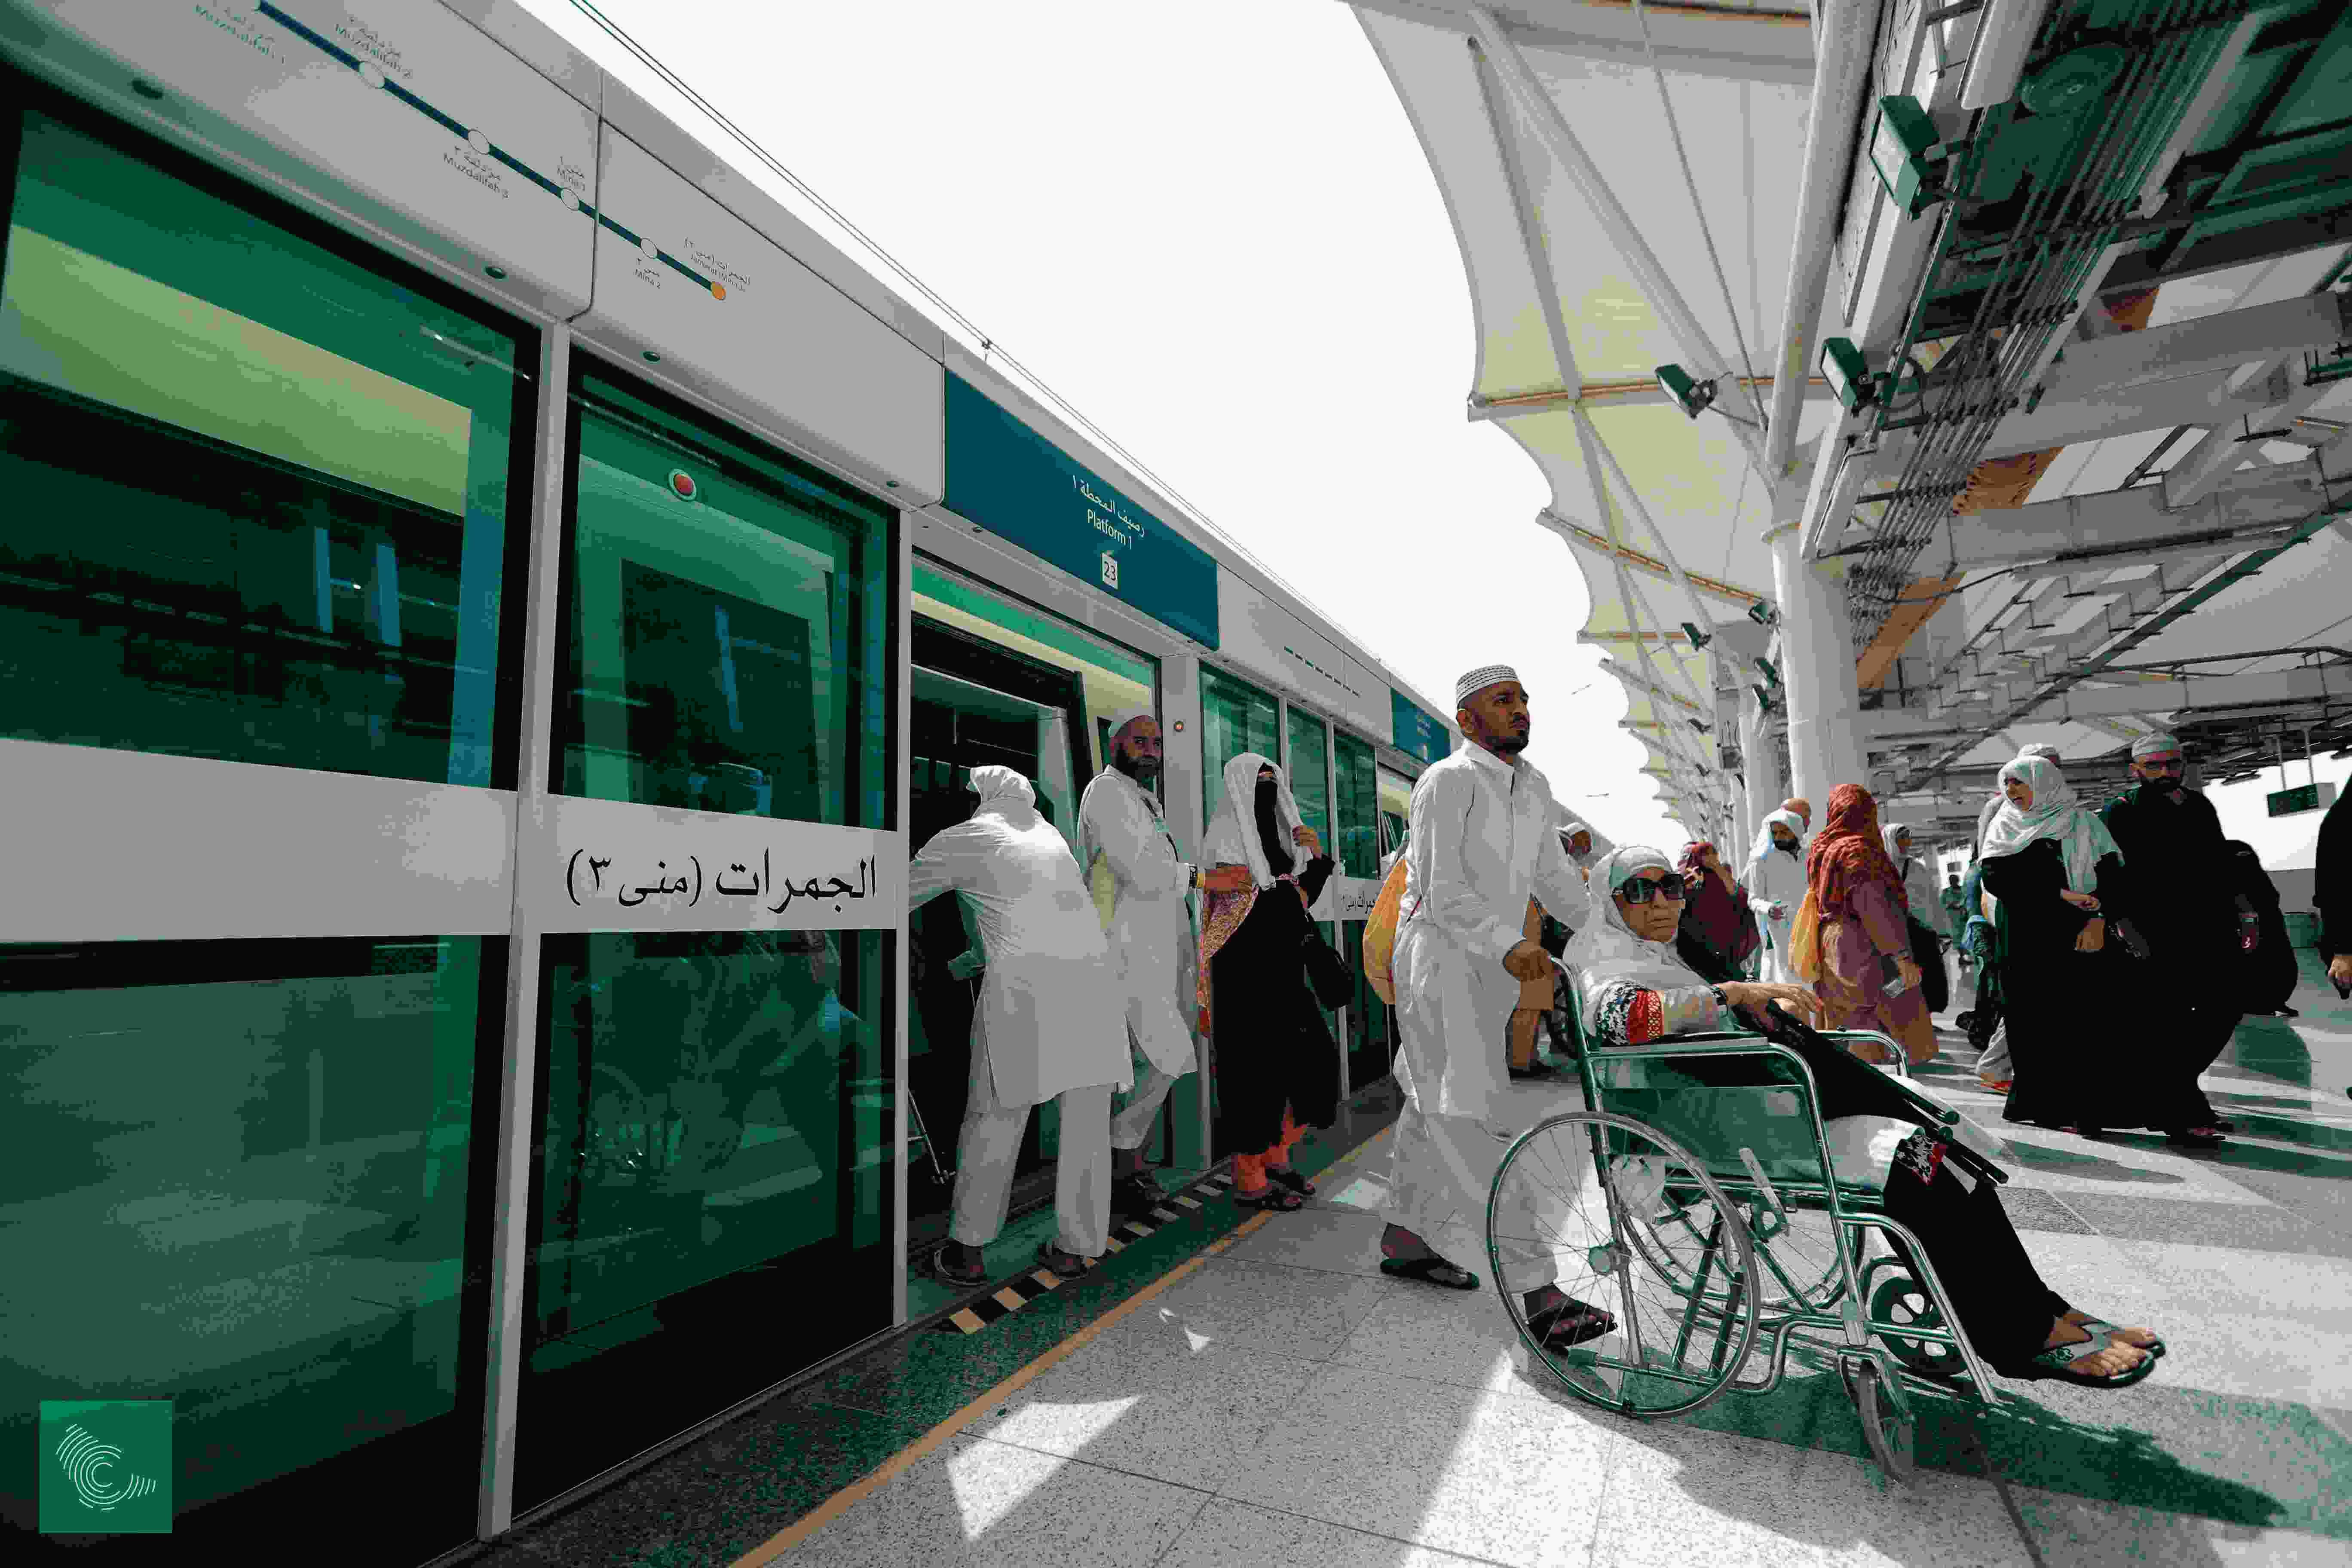 Chinese-built Mecca Light Railway praised by Hajj pilgrims - CGTN